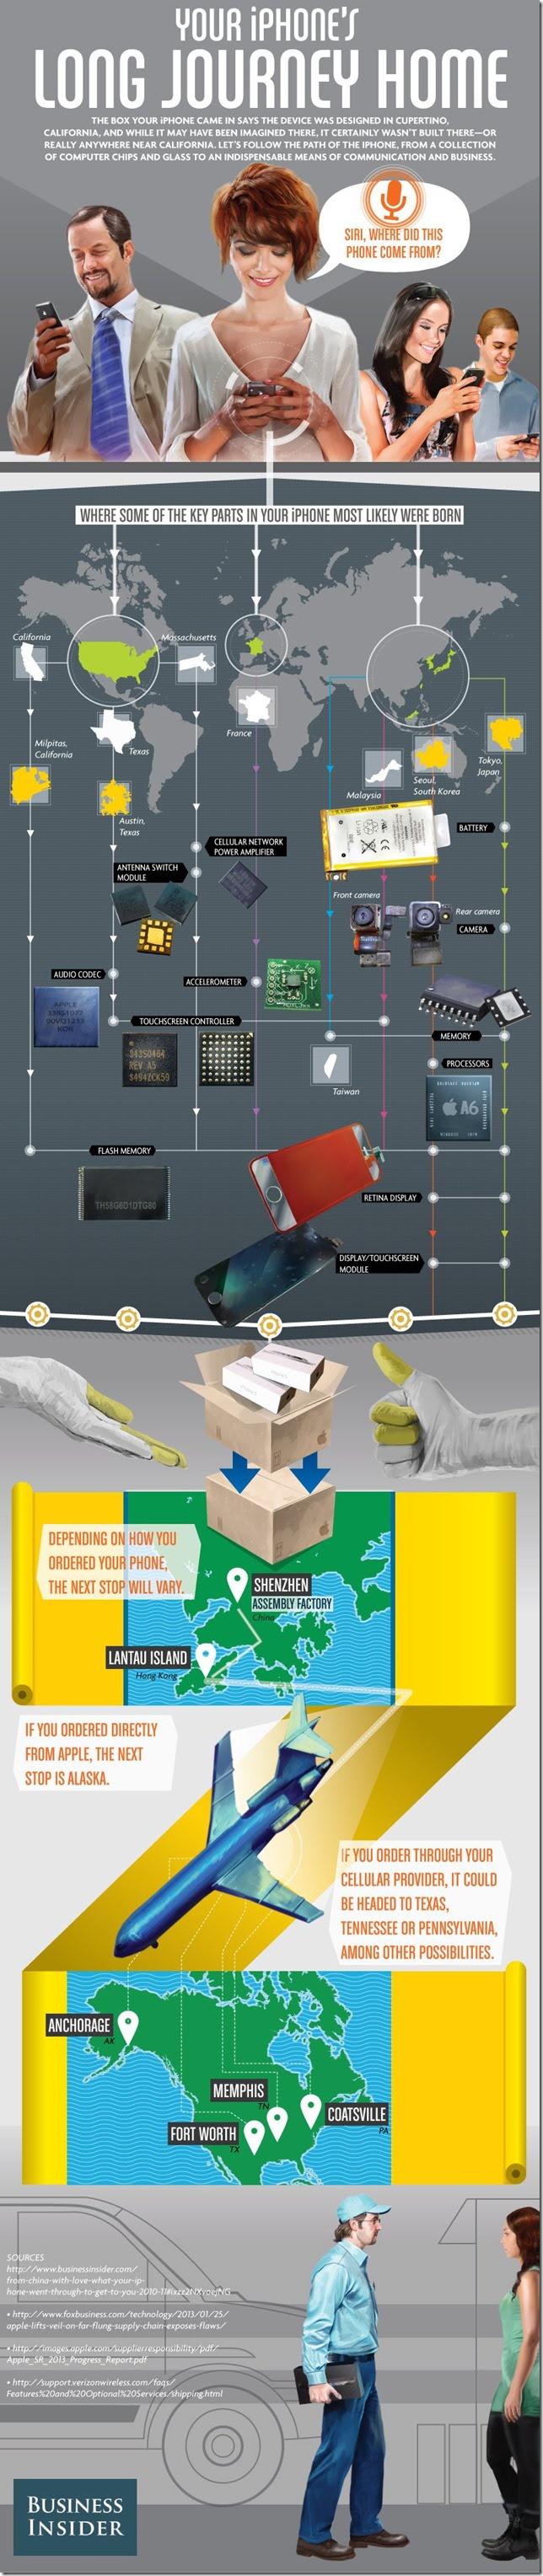 iphone process thumb أنفوجرافيك : مراحل تصنيع الايفون